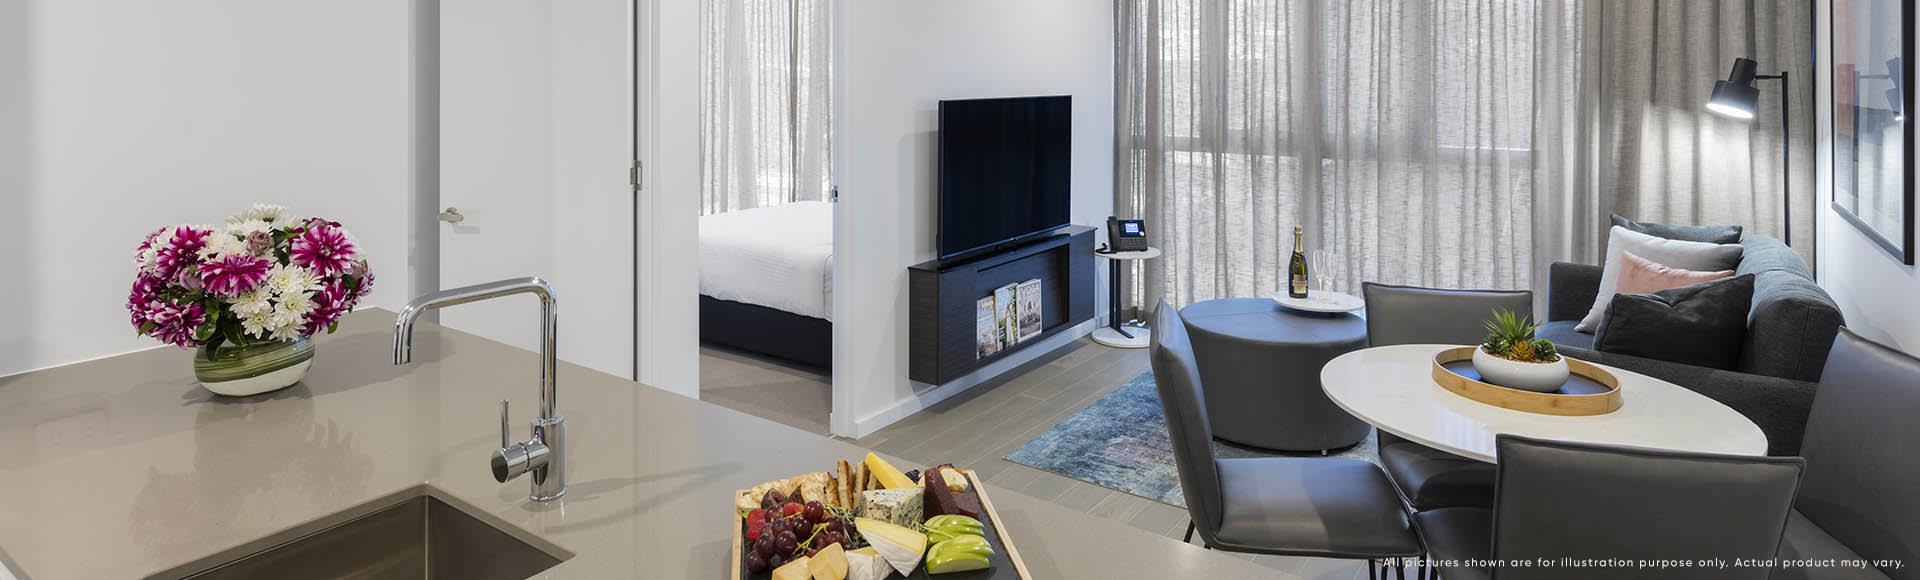 Avani Box Hill 2 Bedroom Suite Lounge 1920x580px